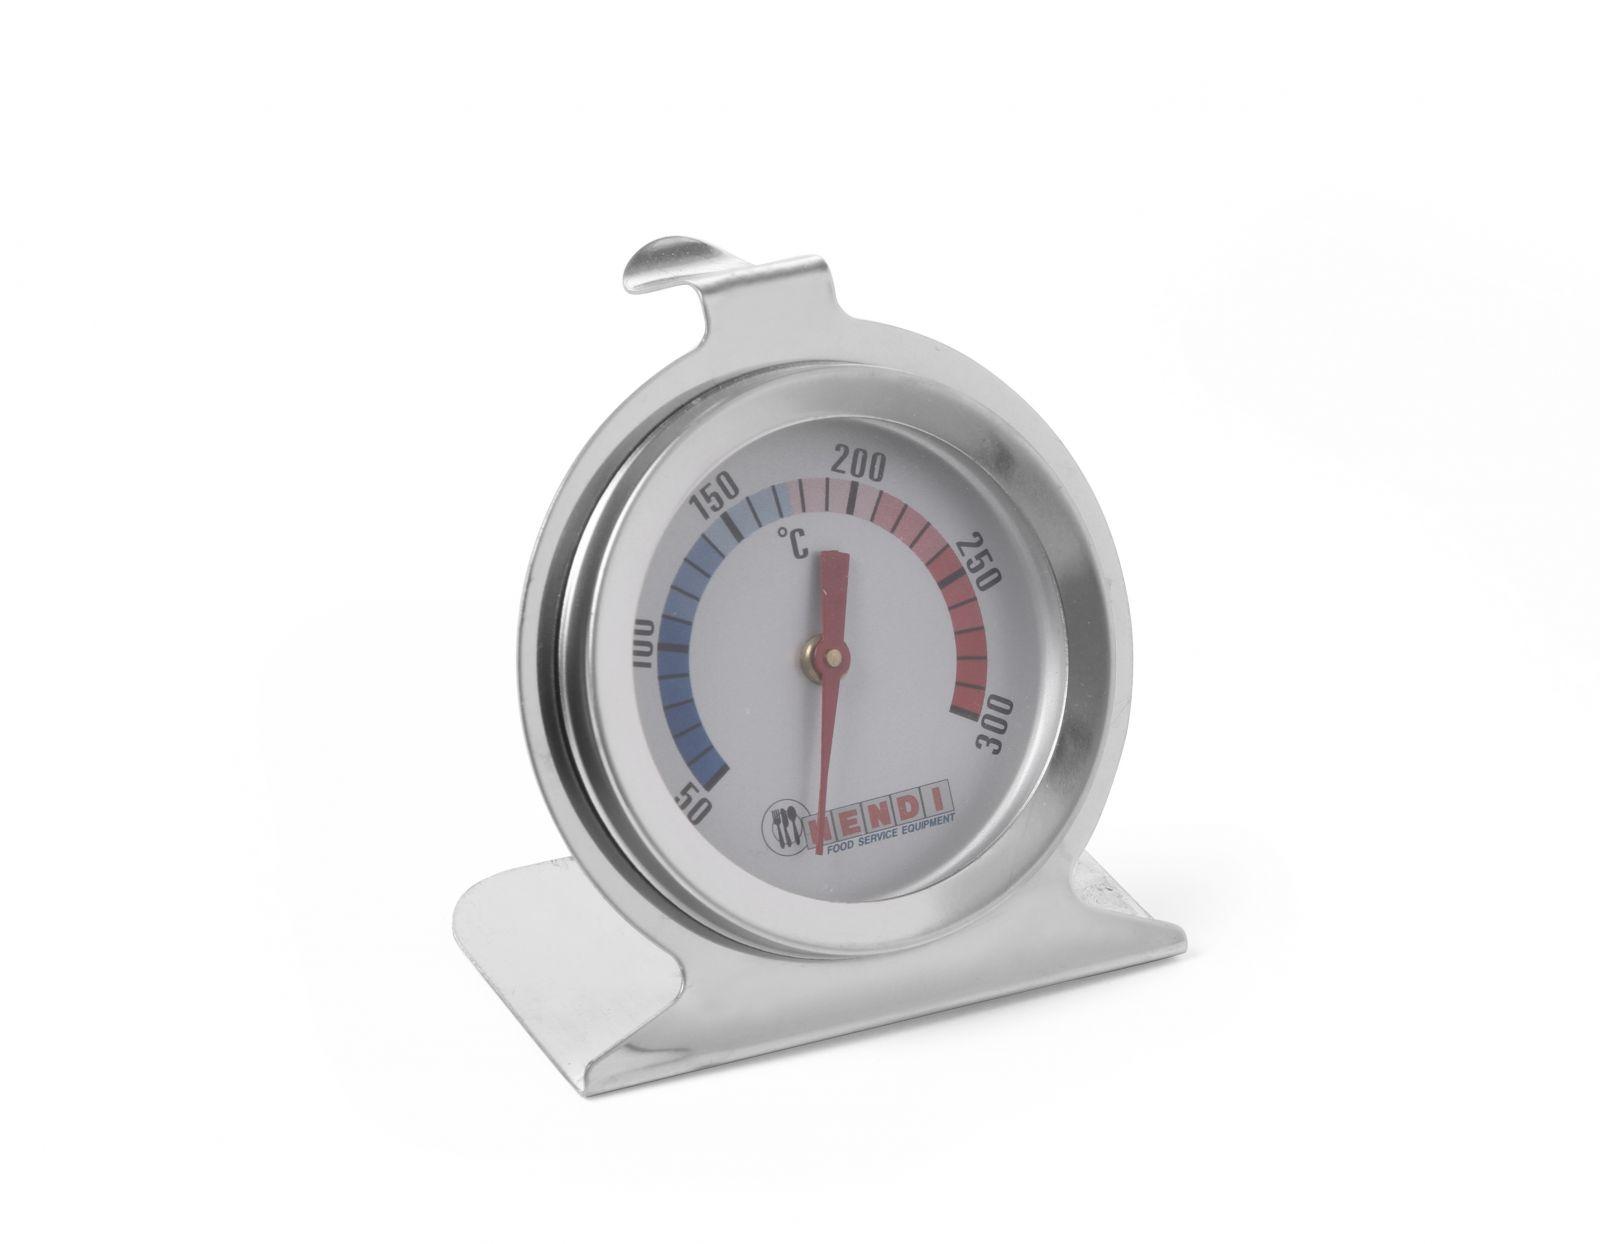 Ručičkový teploměr do trouby na pečení 50 - 300 °C HENDI